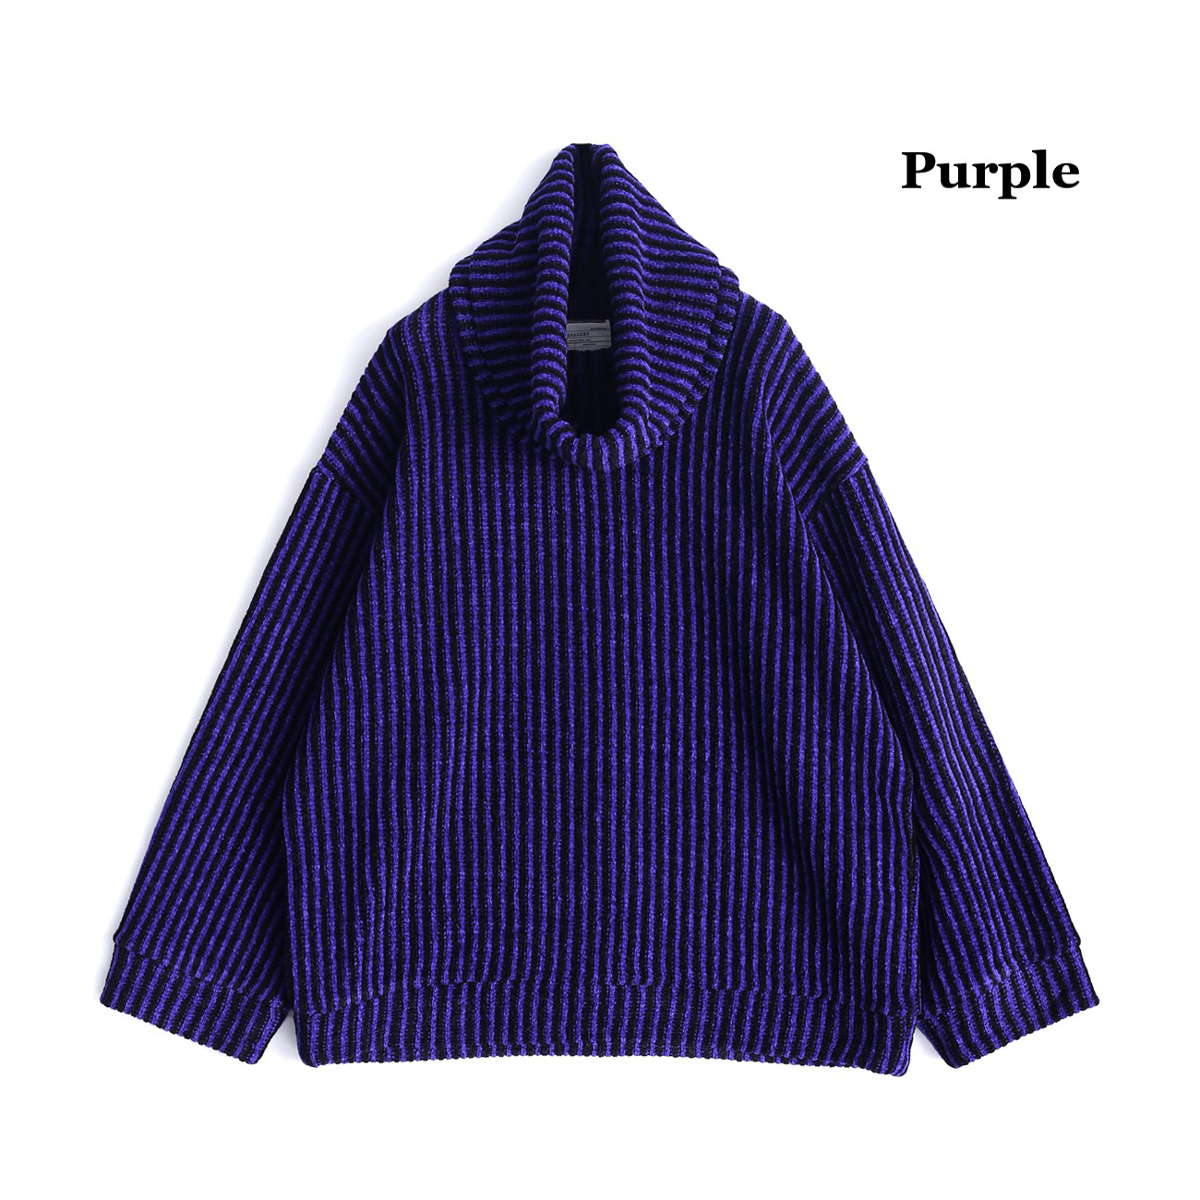 SHAREEF MOLE STRIPE PULL OVER RE-NECK (3色 Purple/Black/Red) 19715061 シャリーフ モール ストライプ プルオーバー ネックウォーマー 脱着可能 日本製 メンズ 送料無料